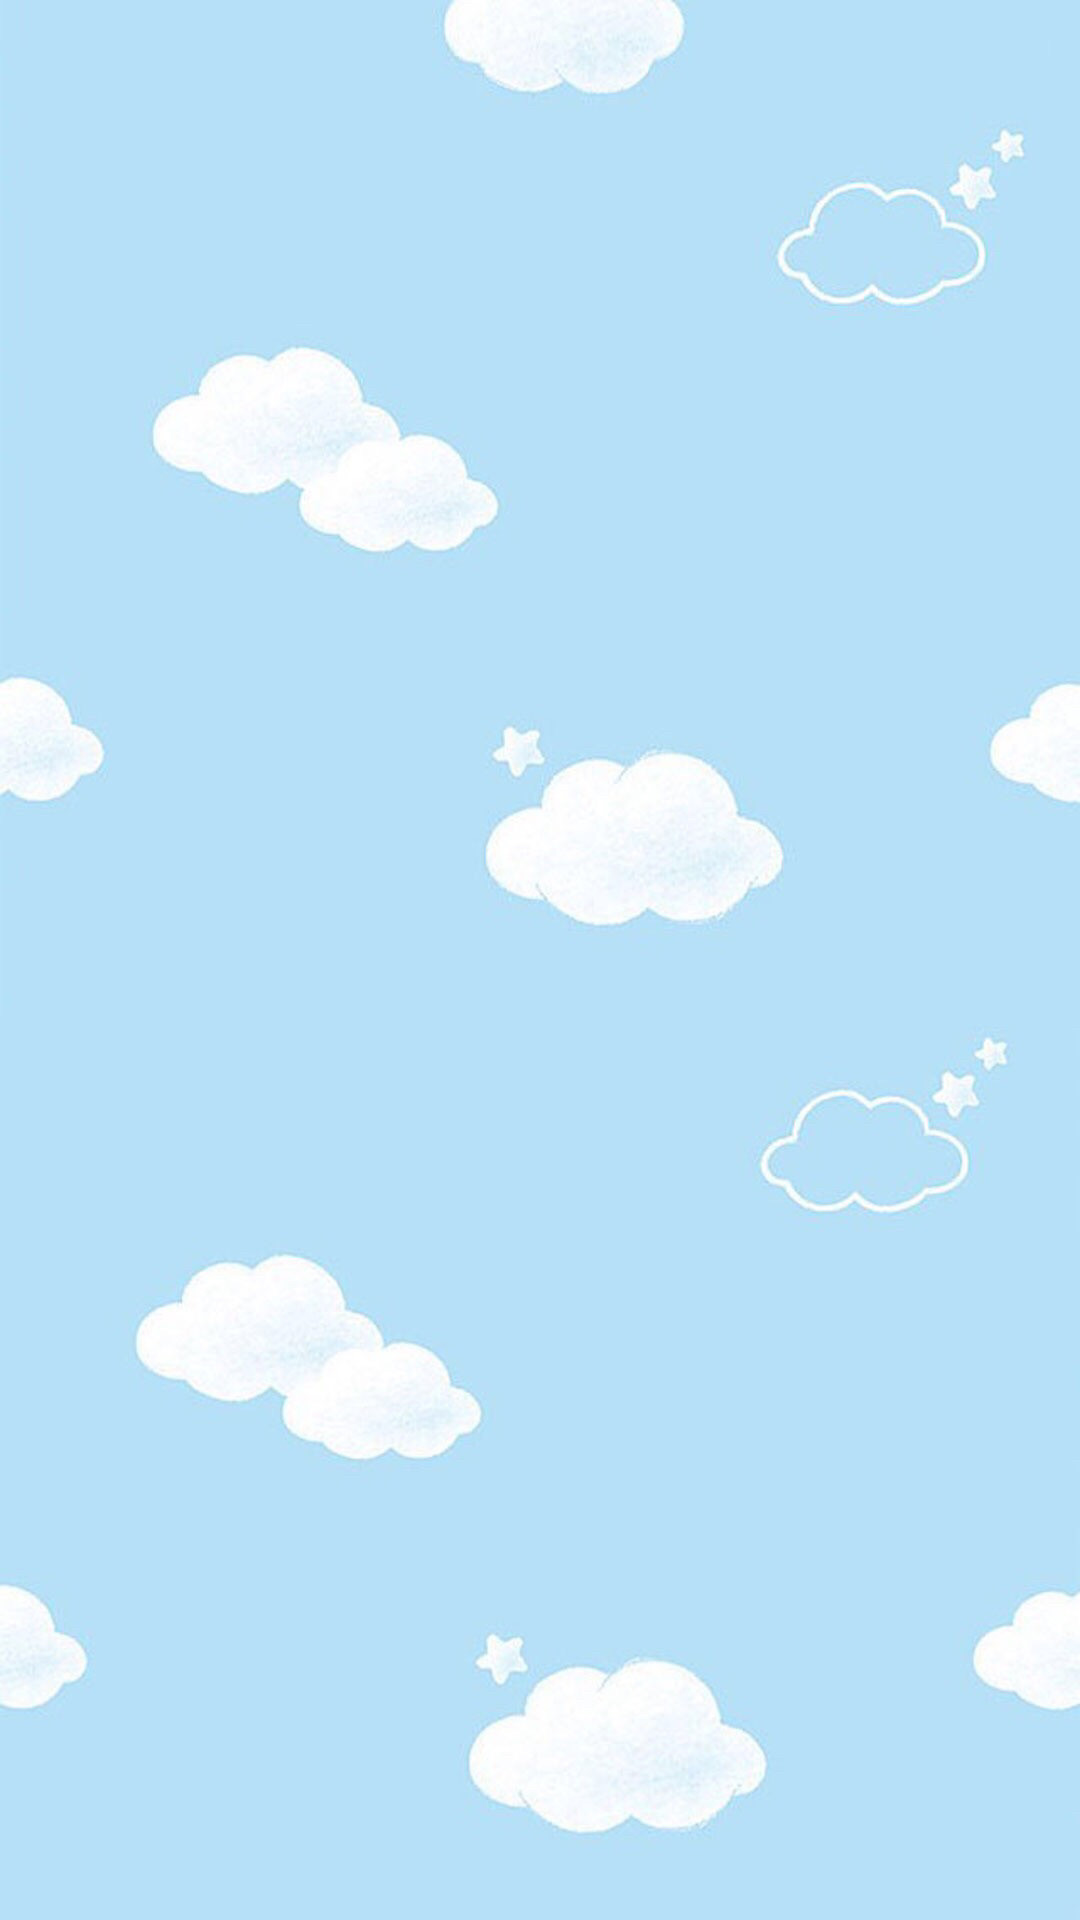 Blue white mini clouds stars iphone wallpaper phone background lock screen